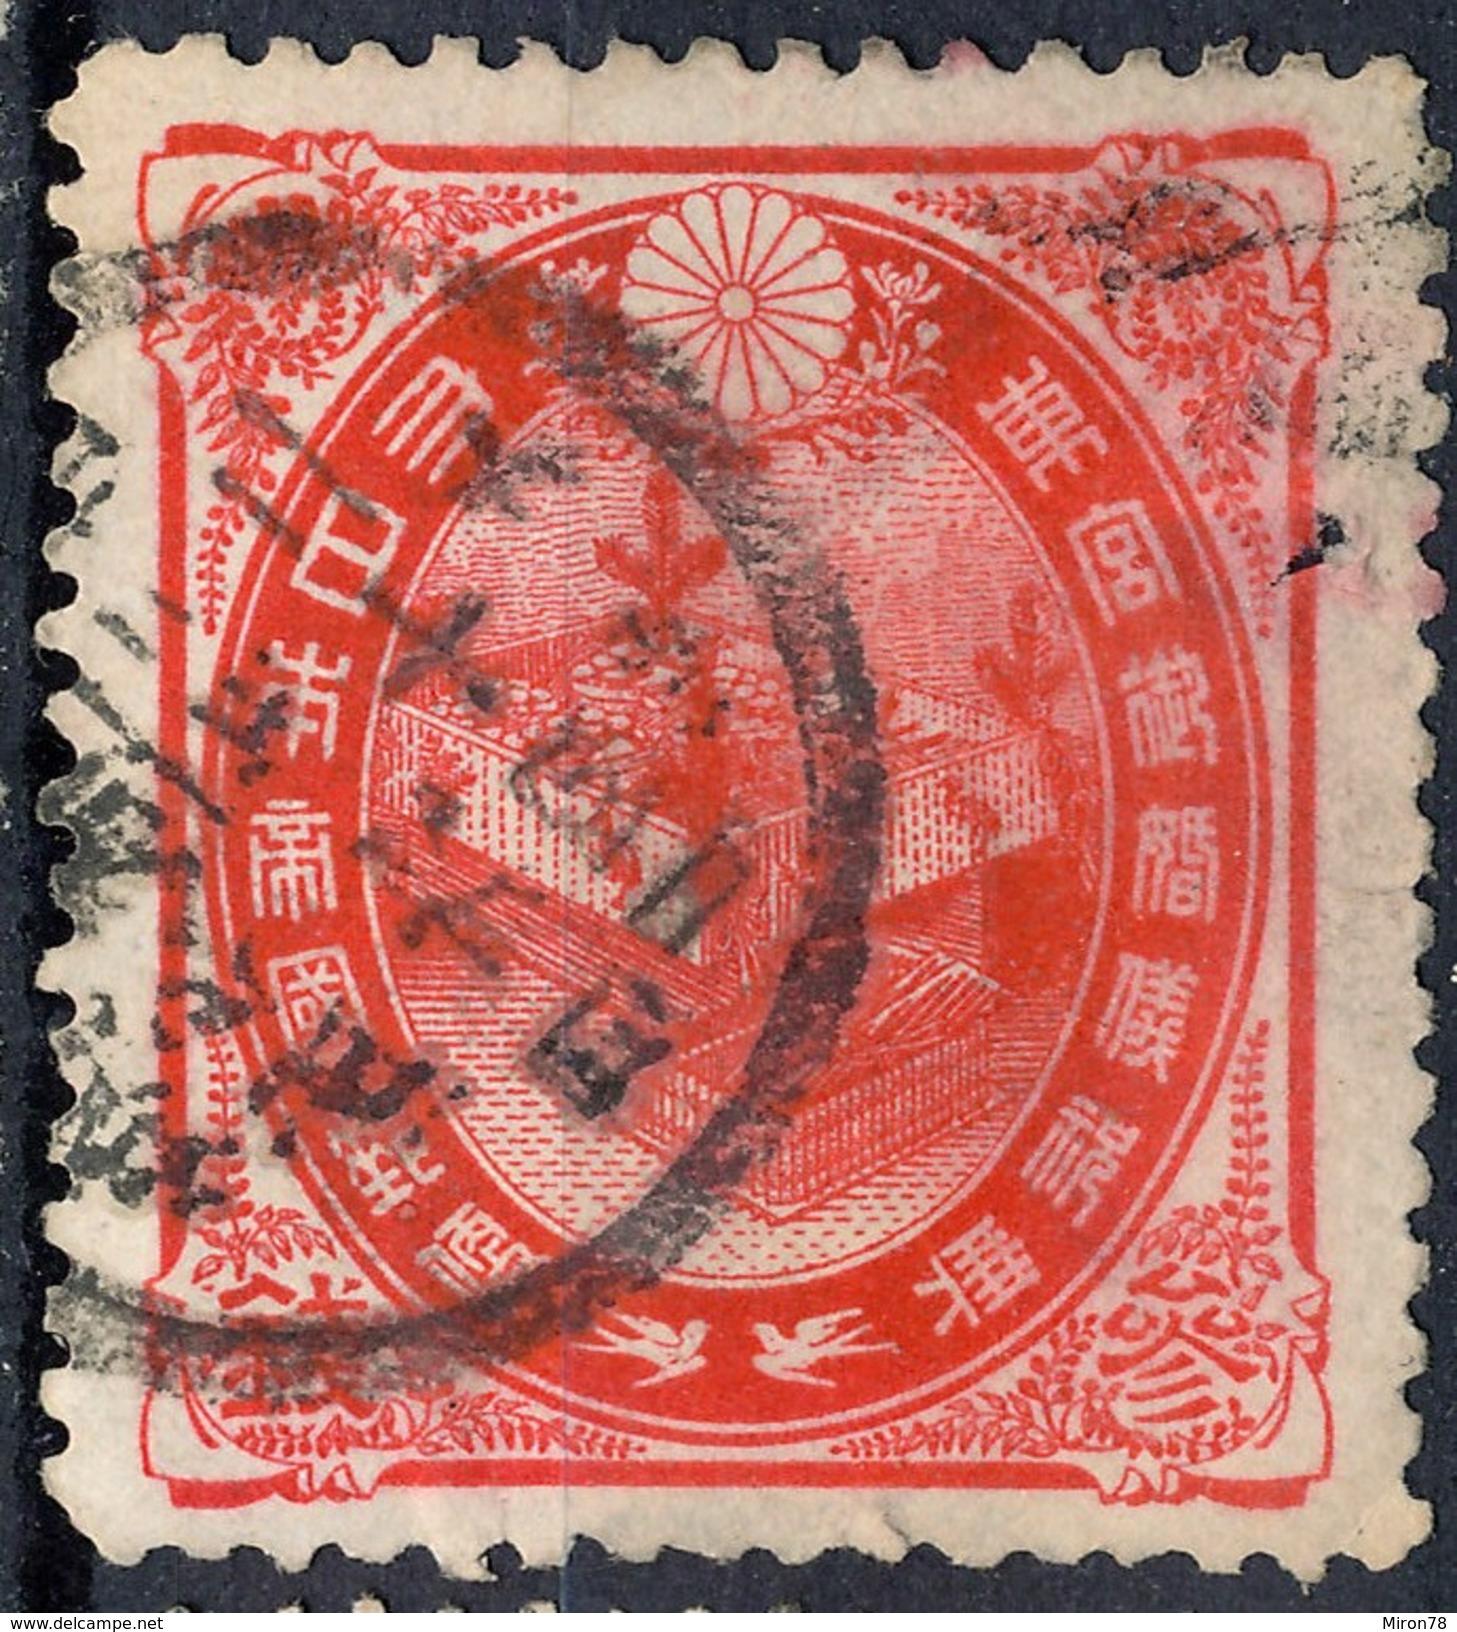 Stamp Japan  1900  3s Used   Lot#60 - Japan